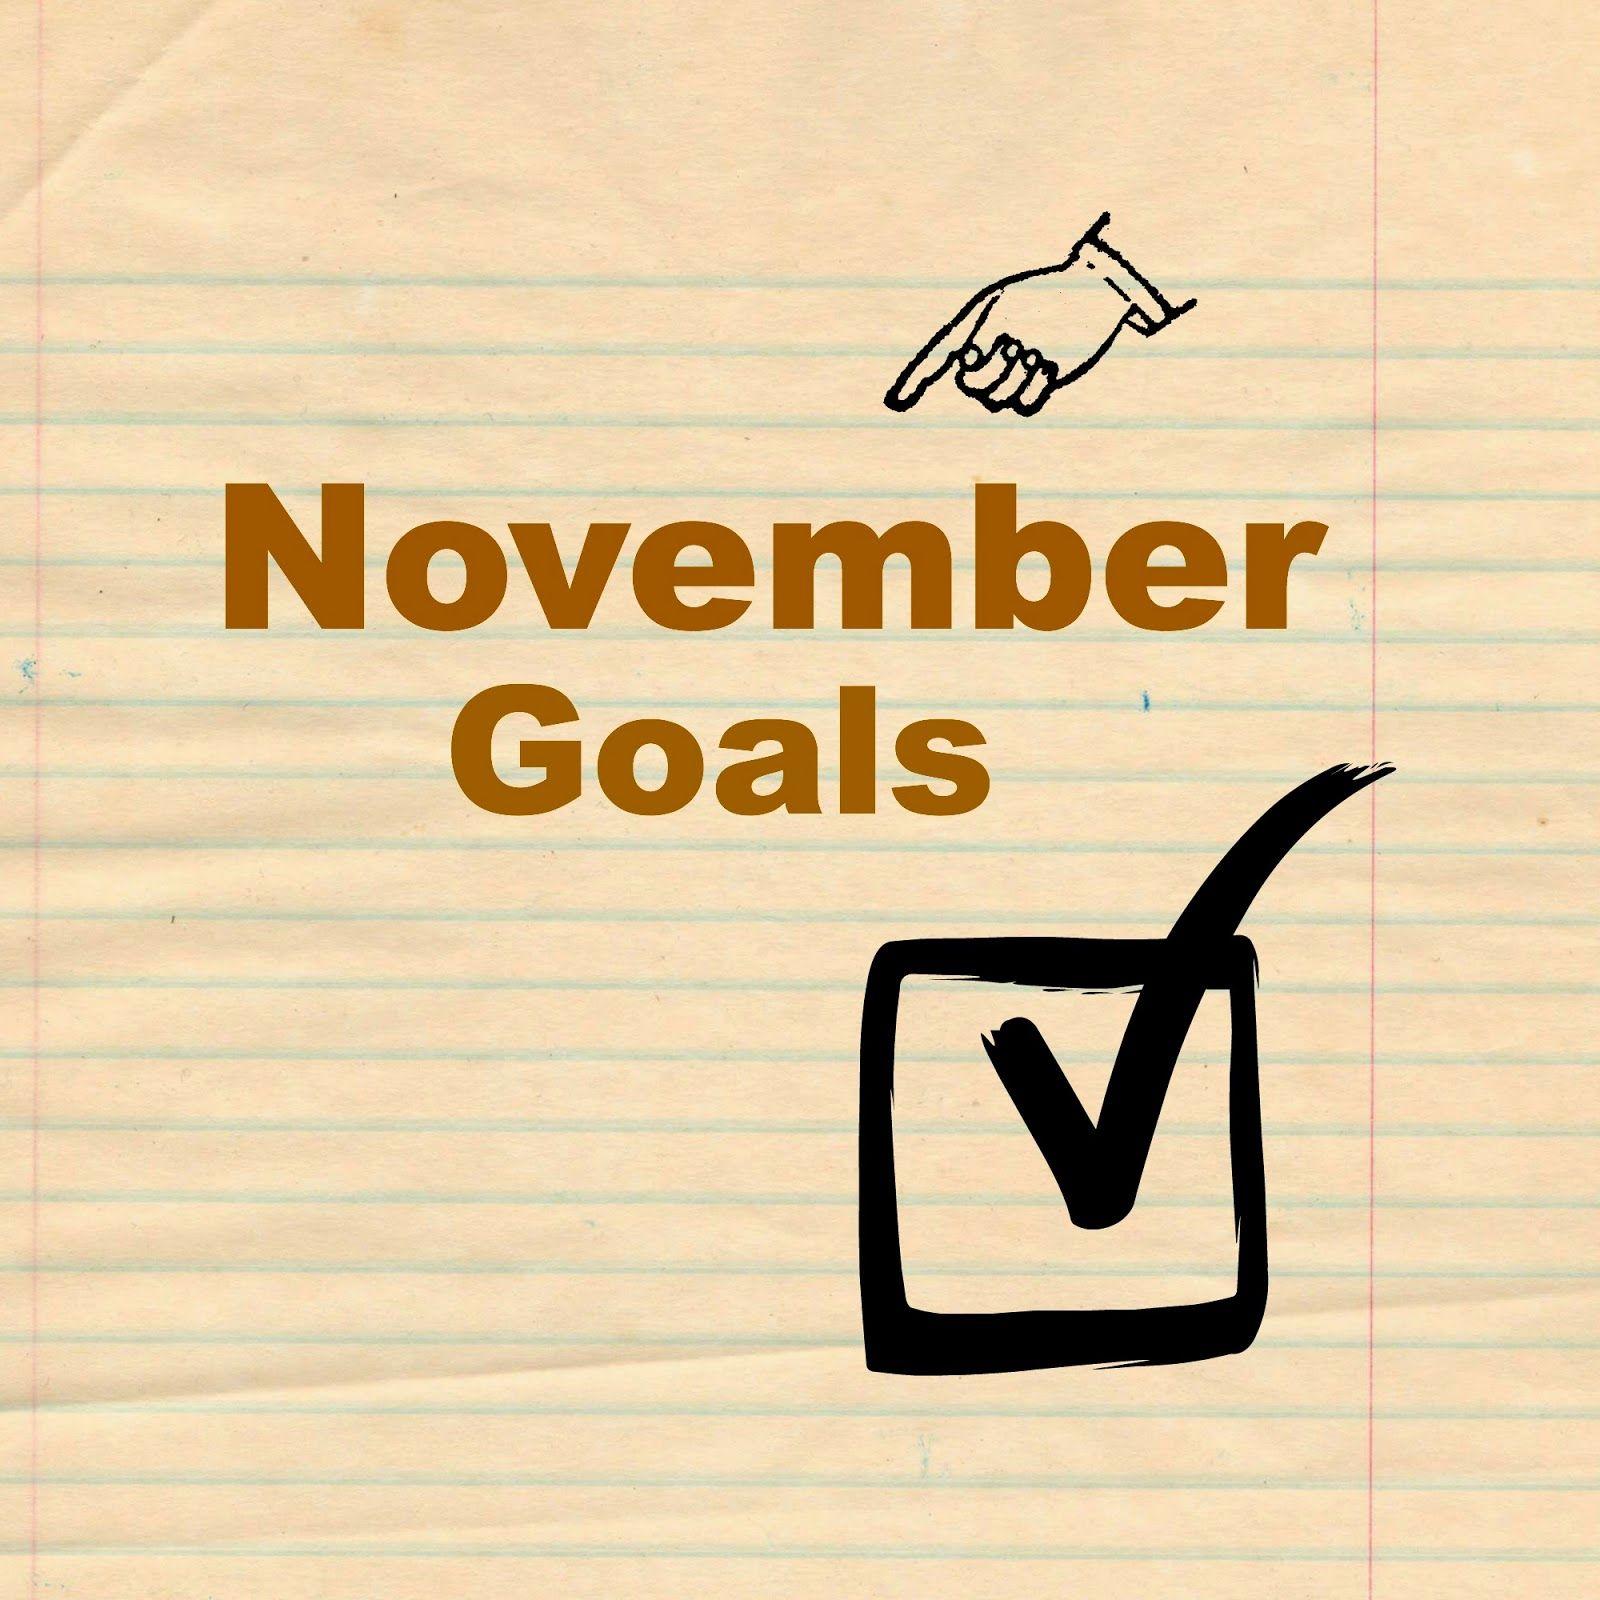 Making my list of goals for November.